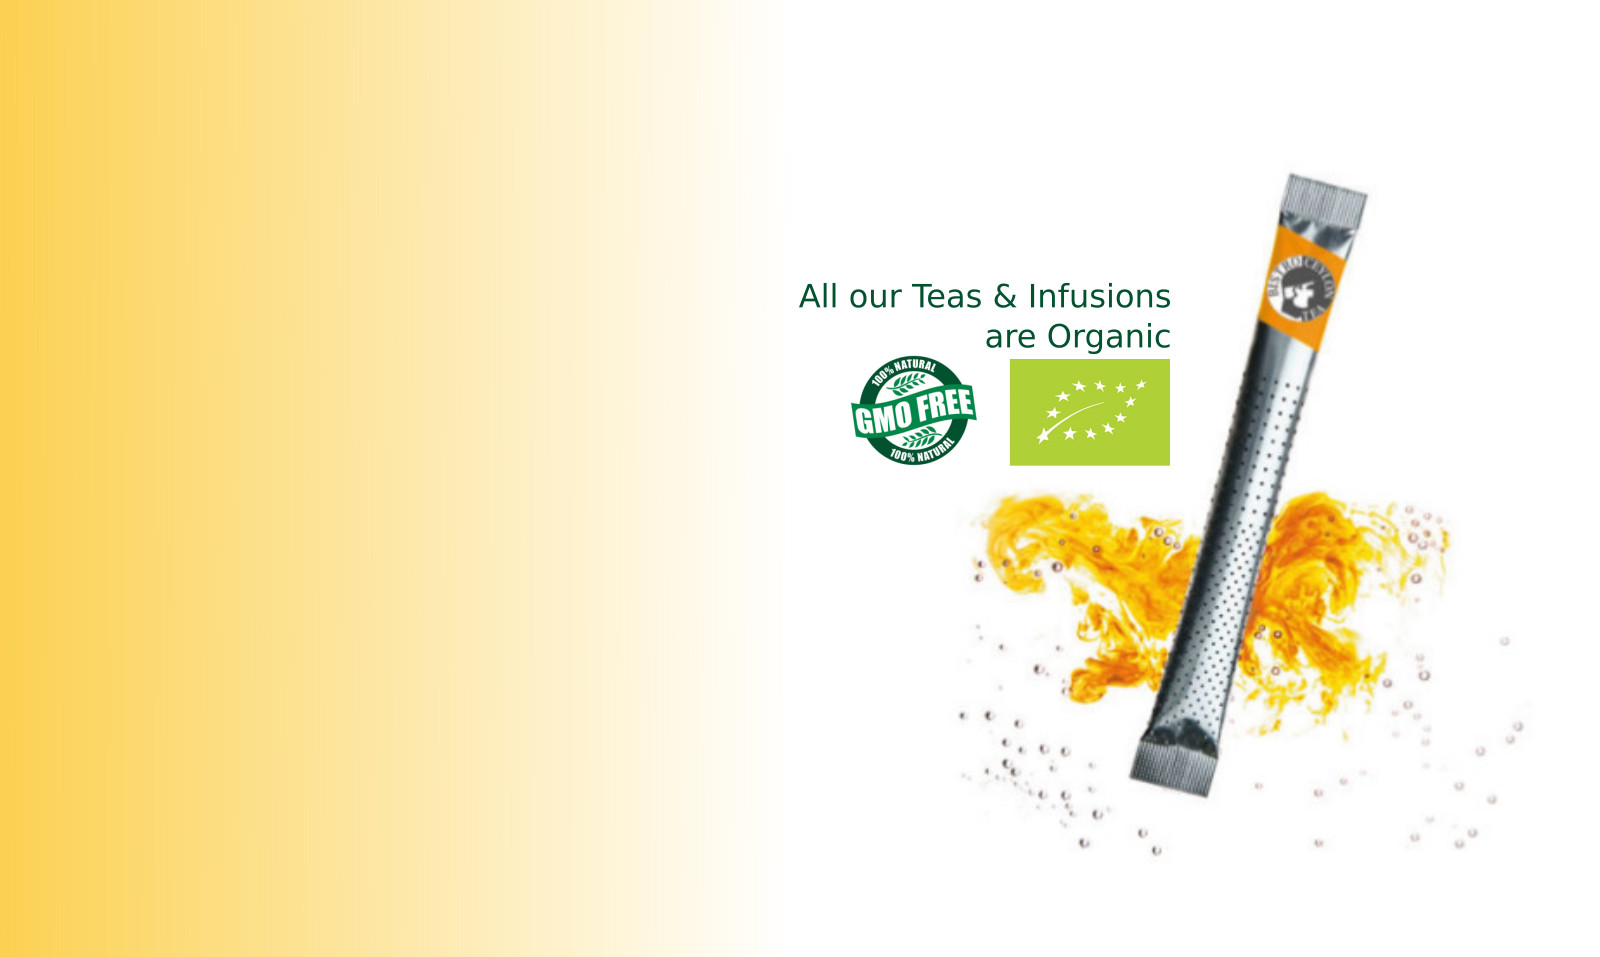 GMO free organic teas & infusions